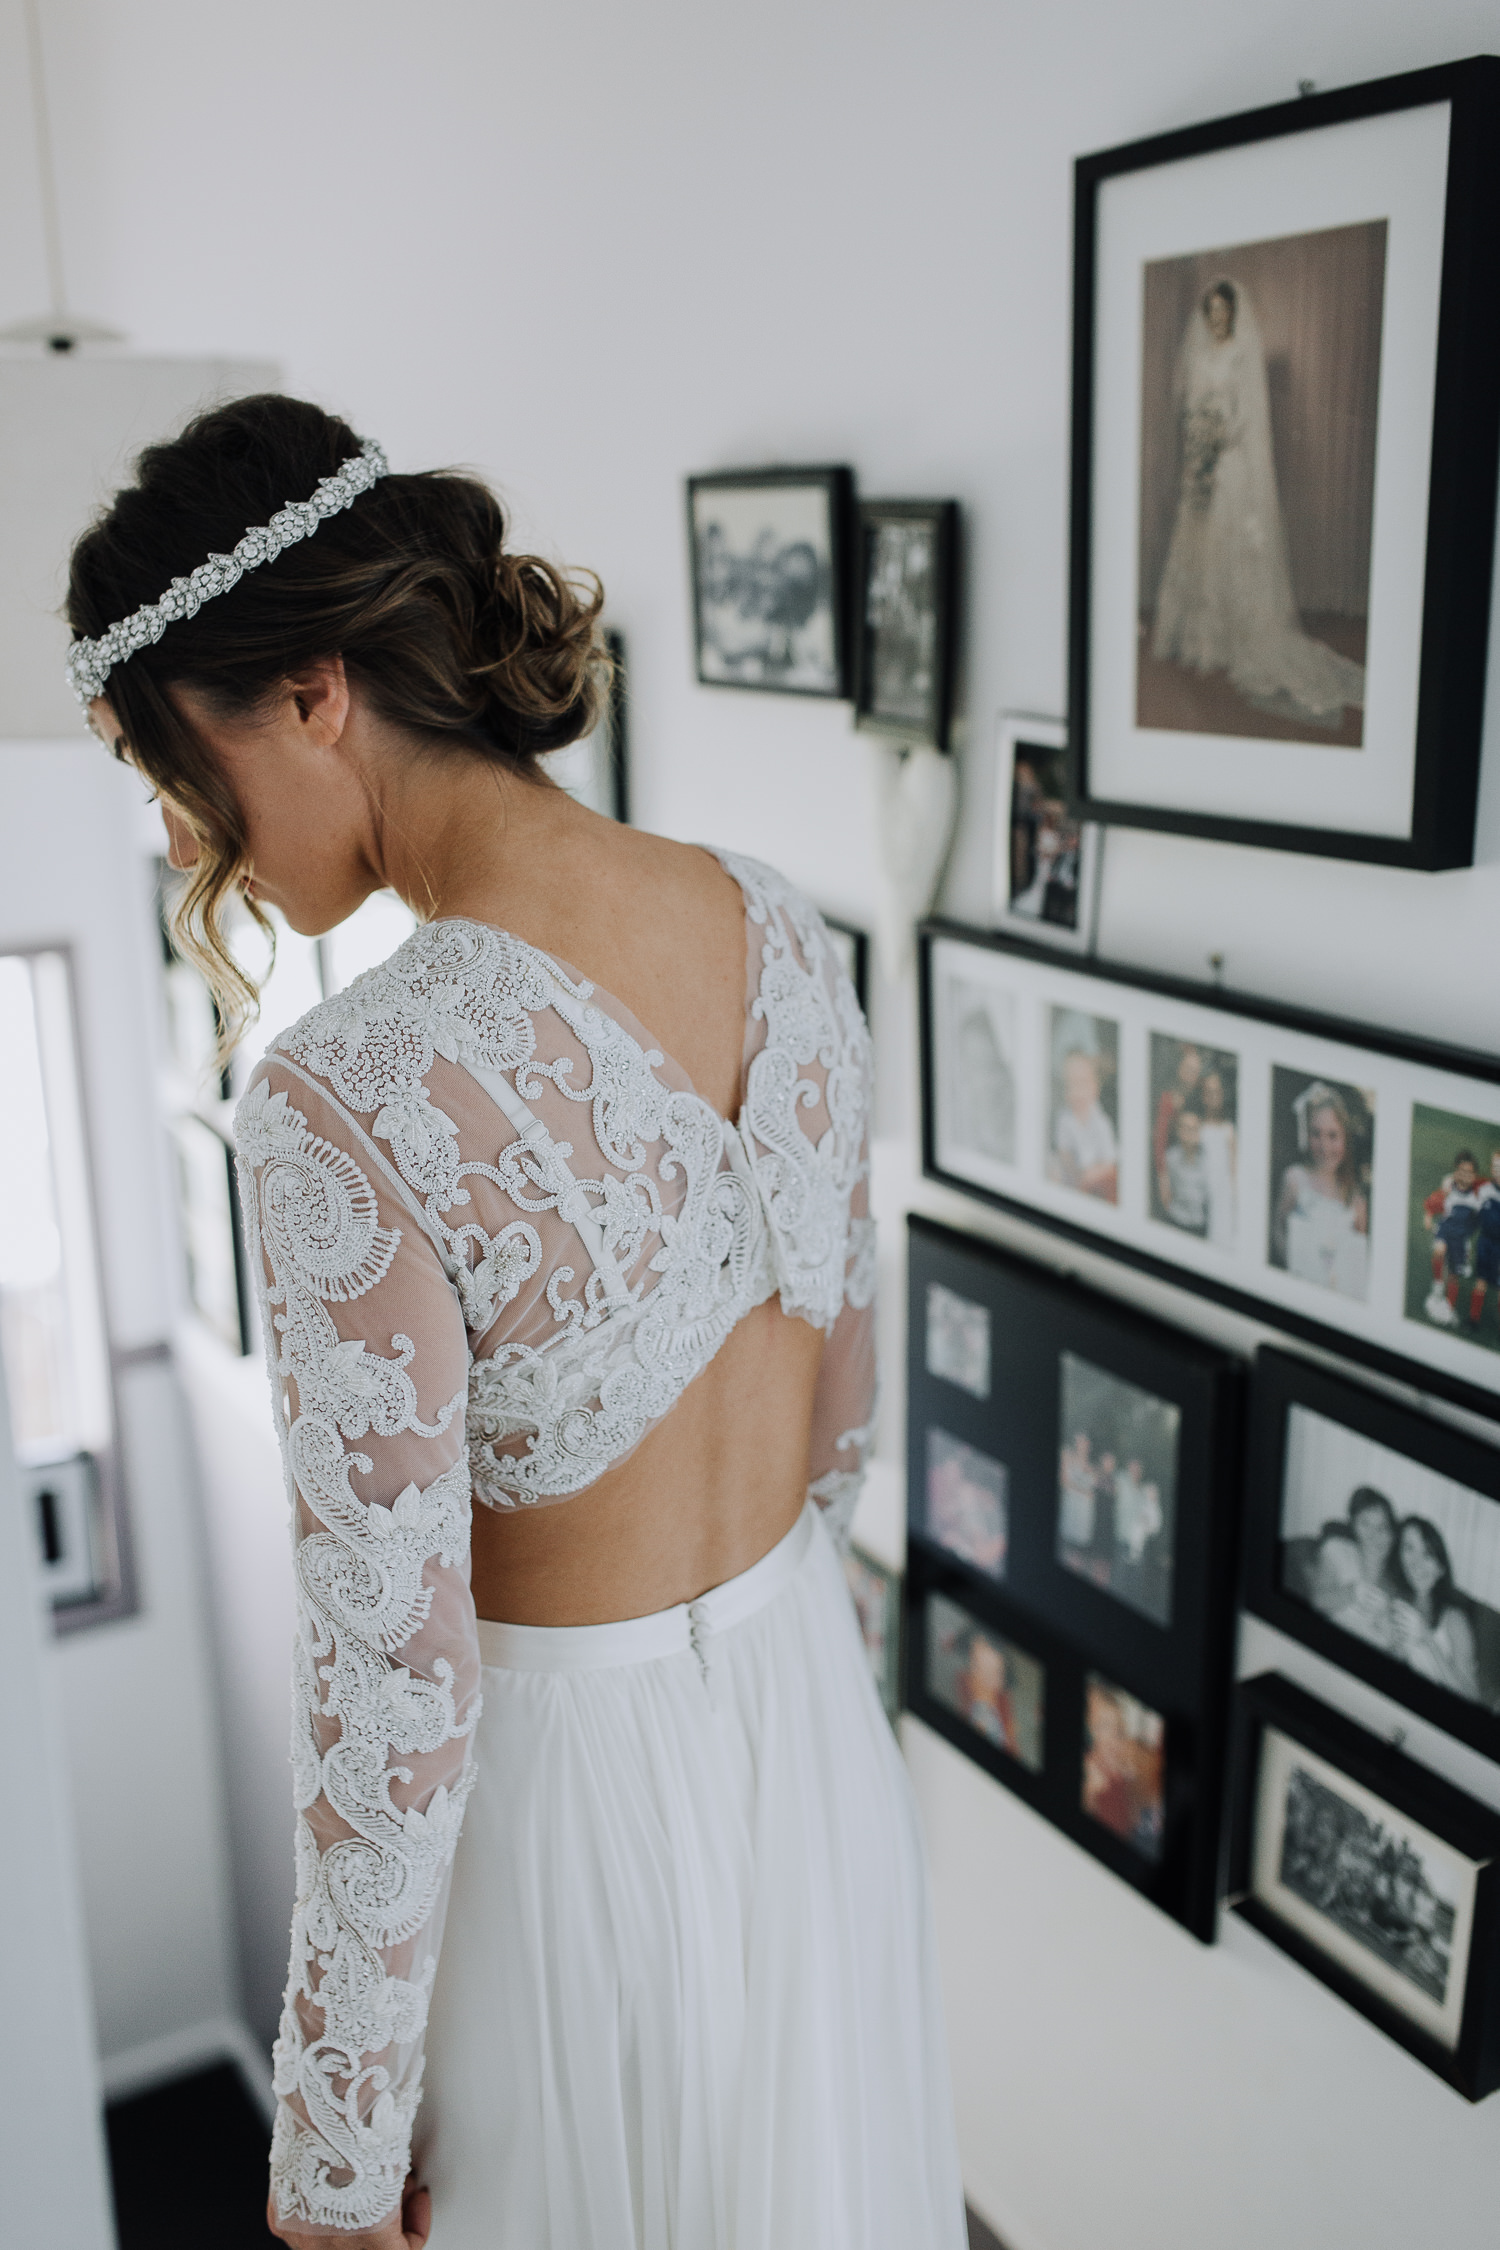 byron_bay_wedding_photographer016.jpg